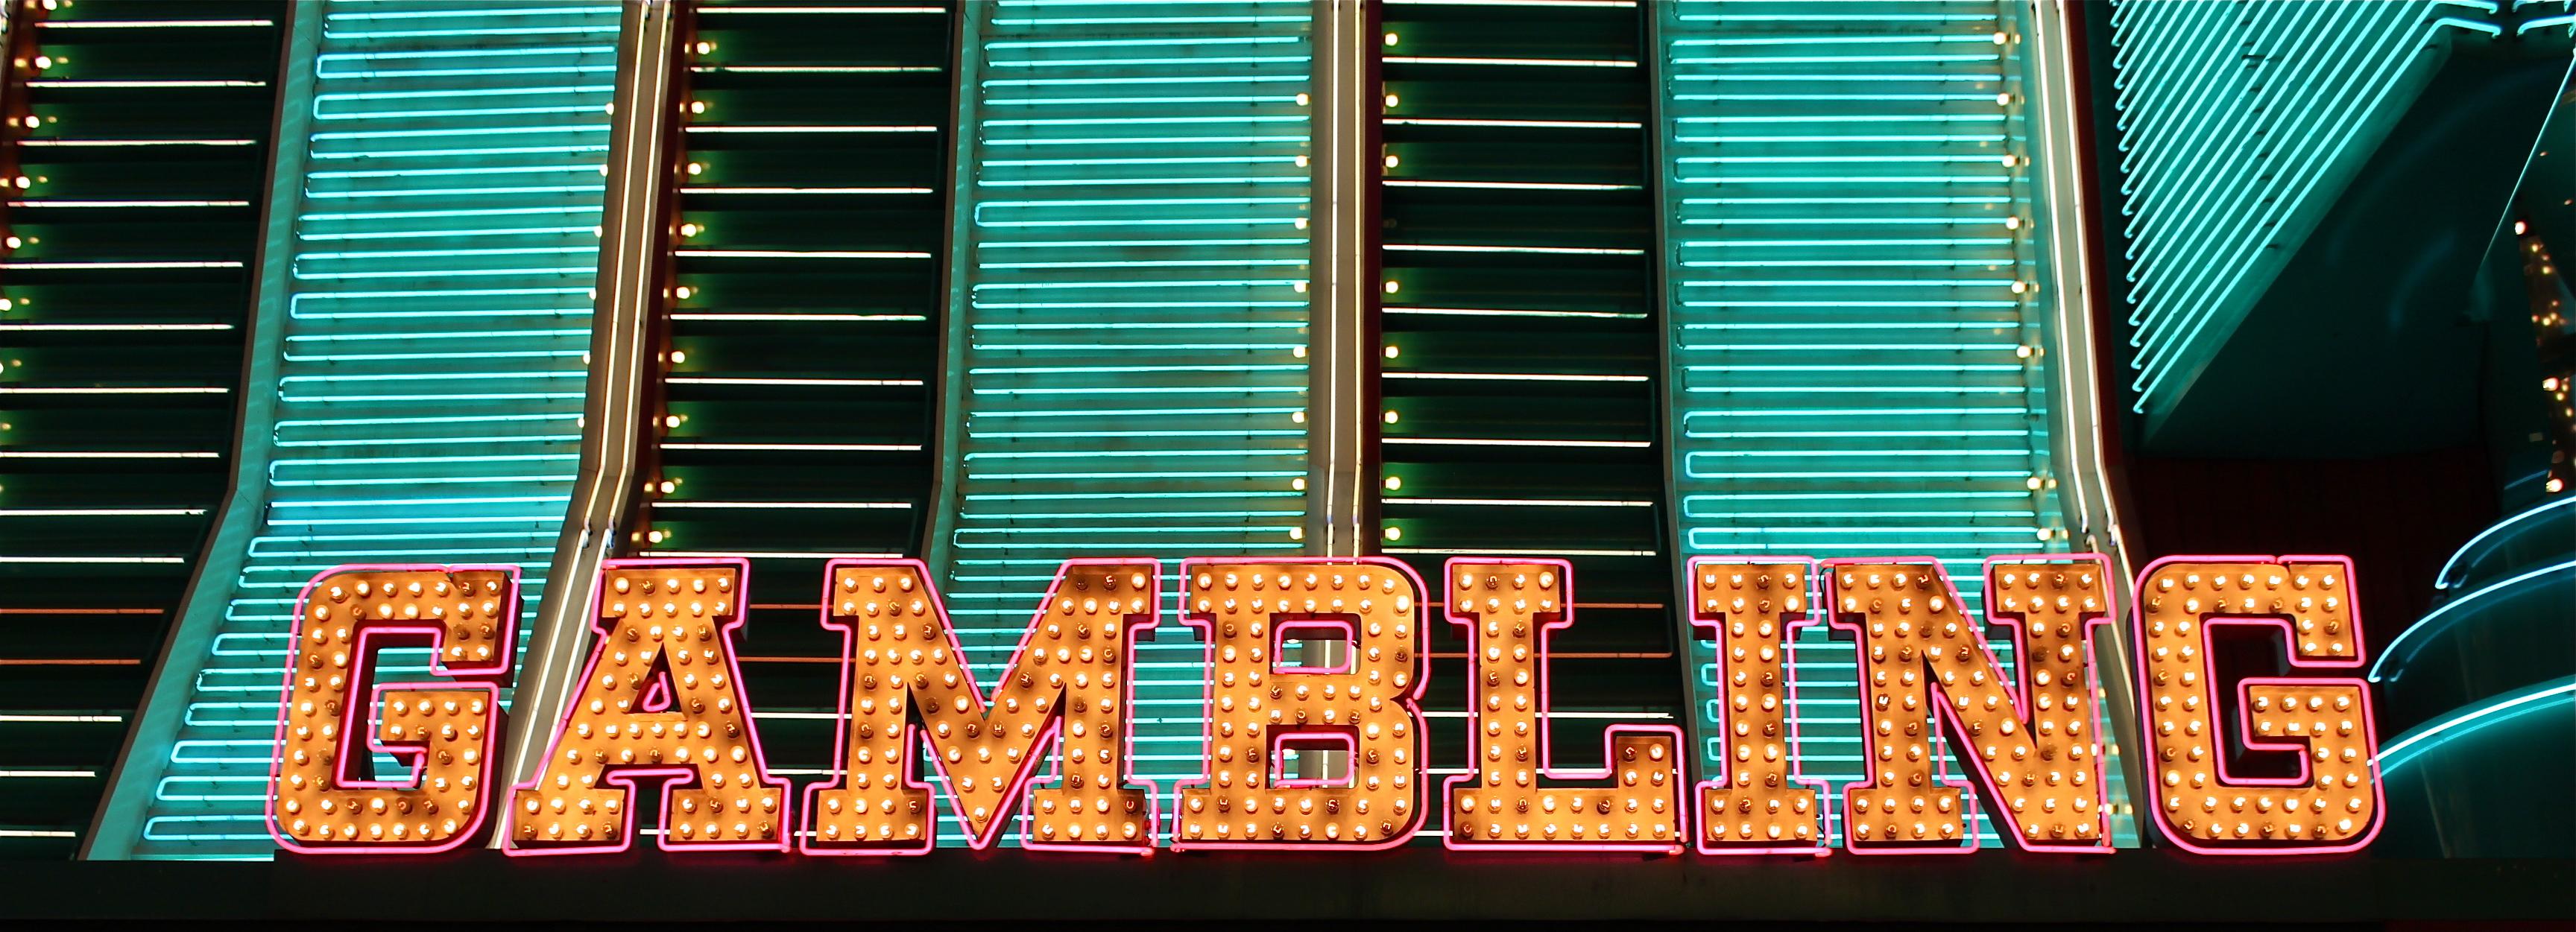 Binions gambling gambling free slots